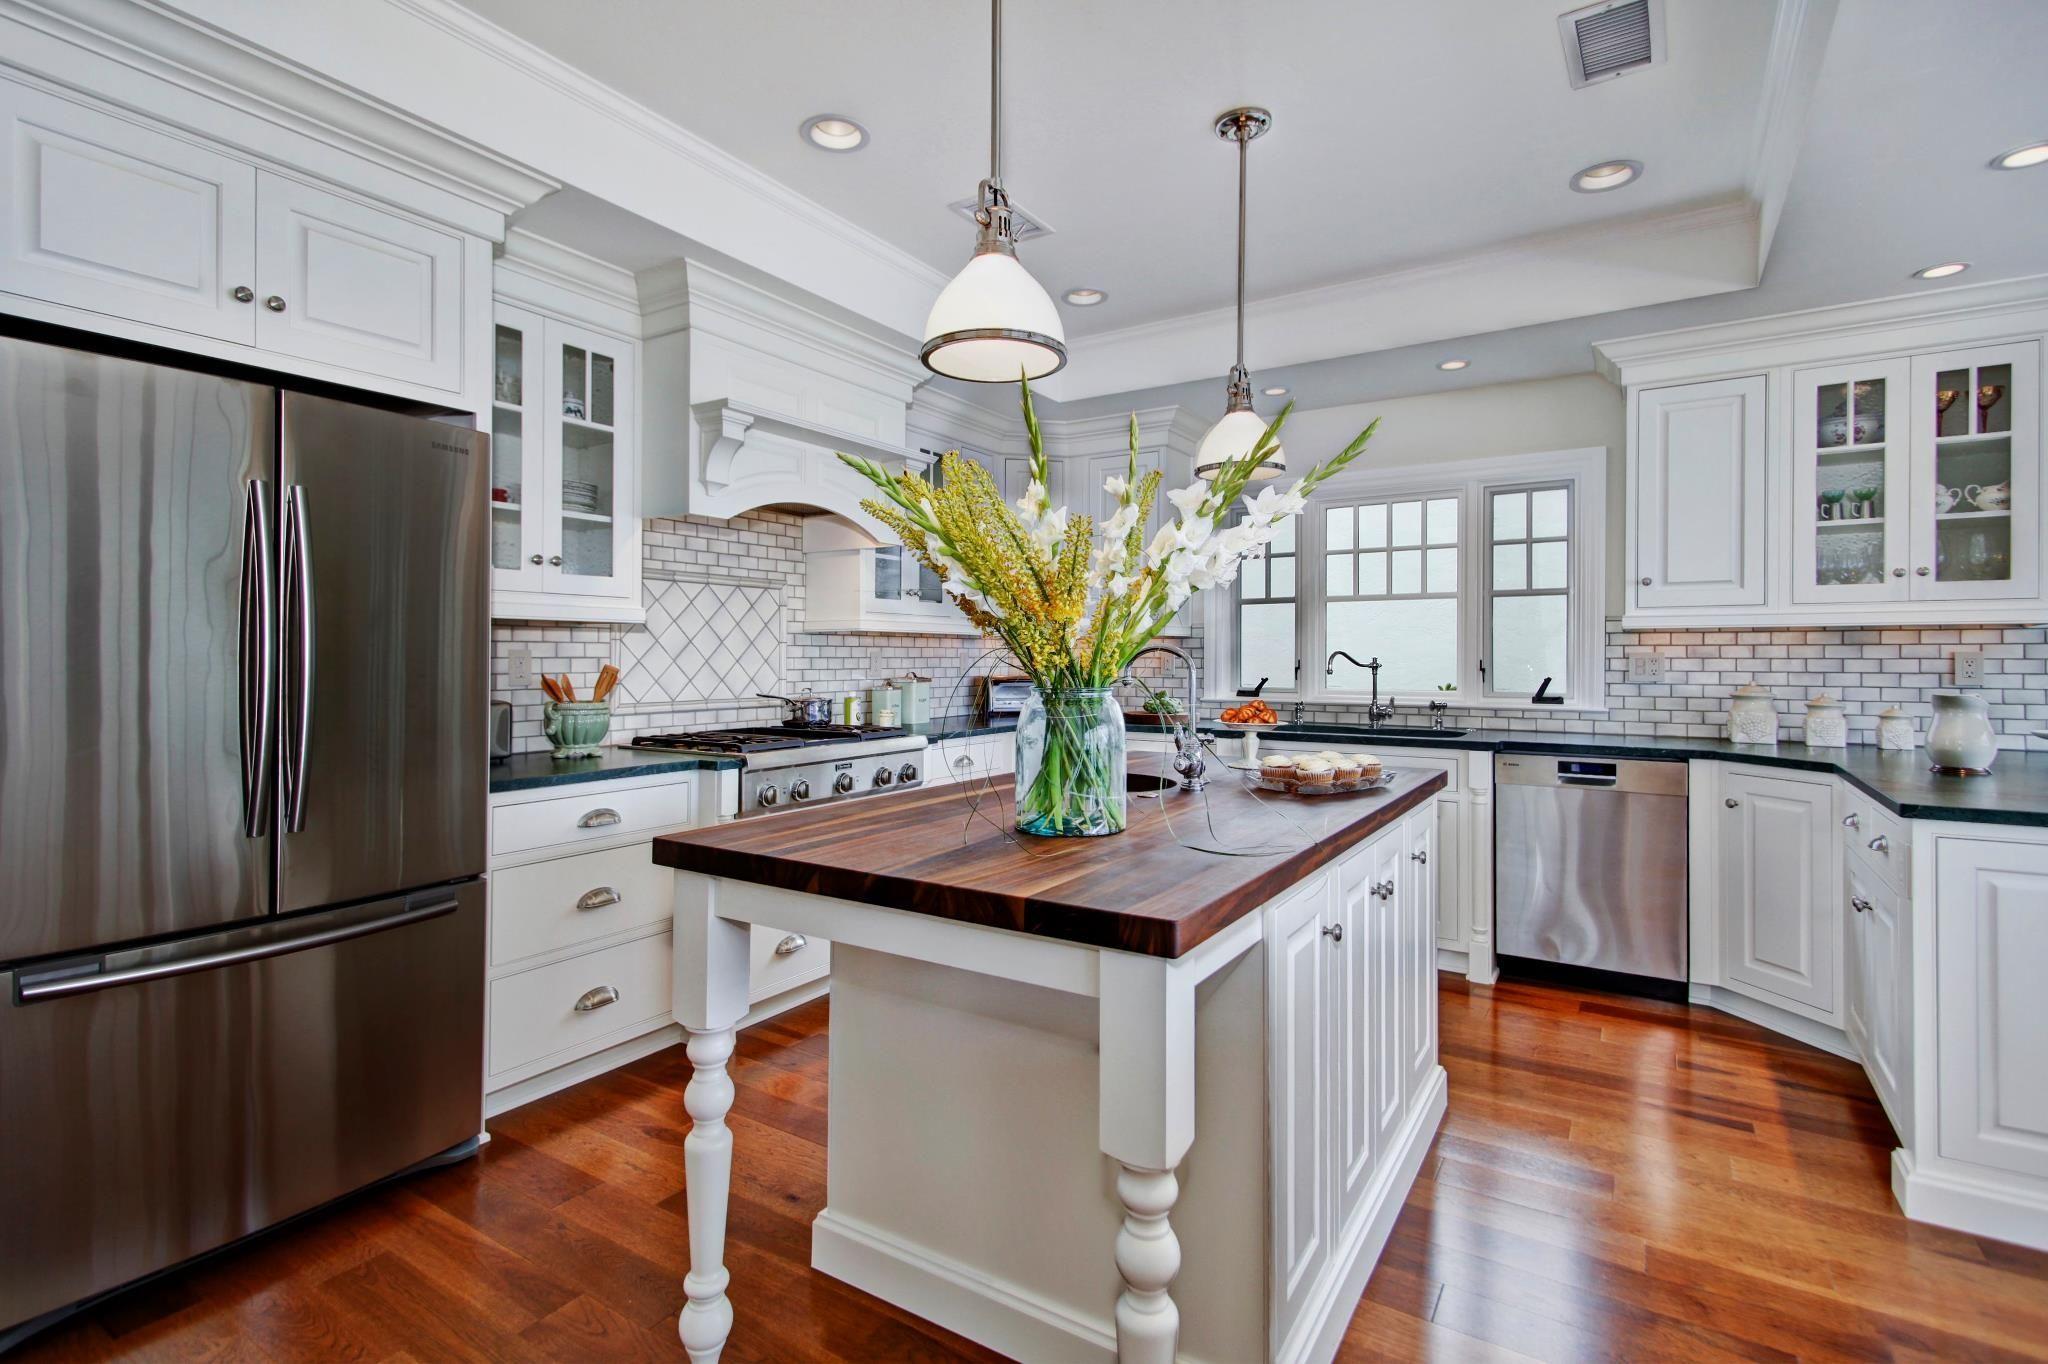 Best Kitchen Gallery: Most Popular Kitchen Cabi Door Styles 2017 Betdaffaires of Most Popular Kitchen Cabinets on rachelxblog.com